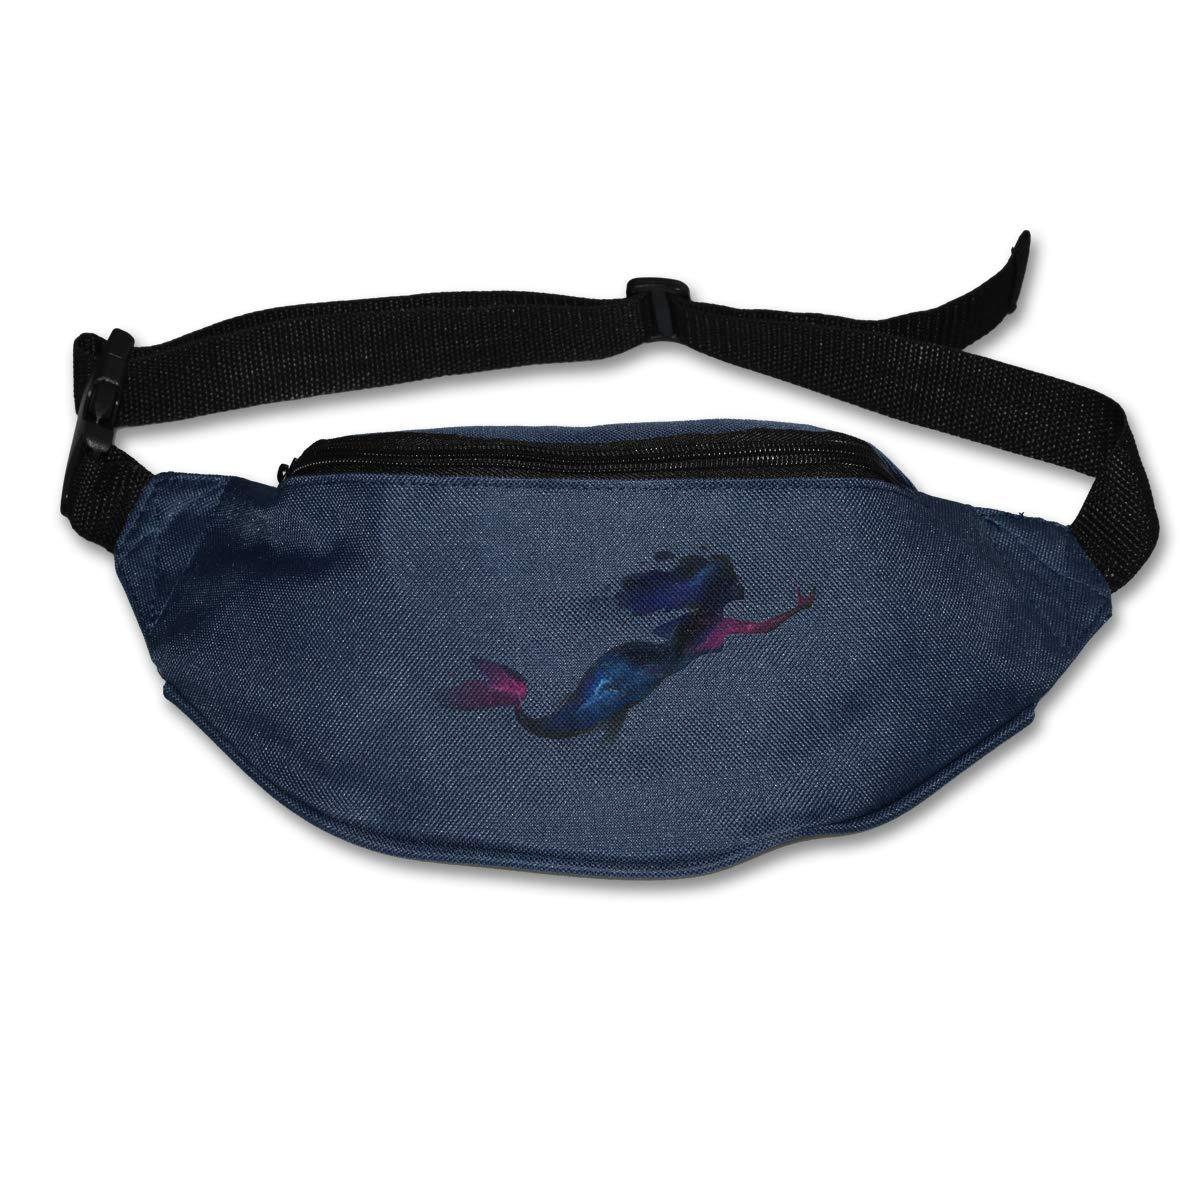 Galaxy Mermaid Sport Waist Packs Fanny Pack Adjustable For Travel